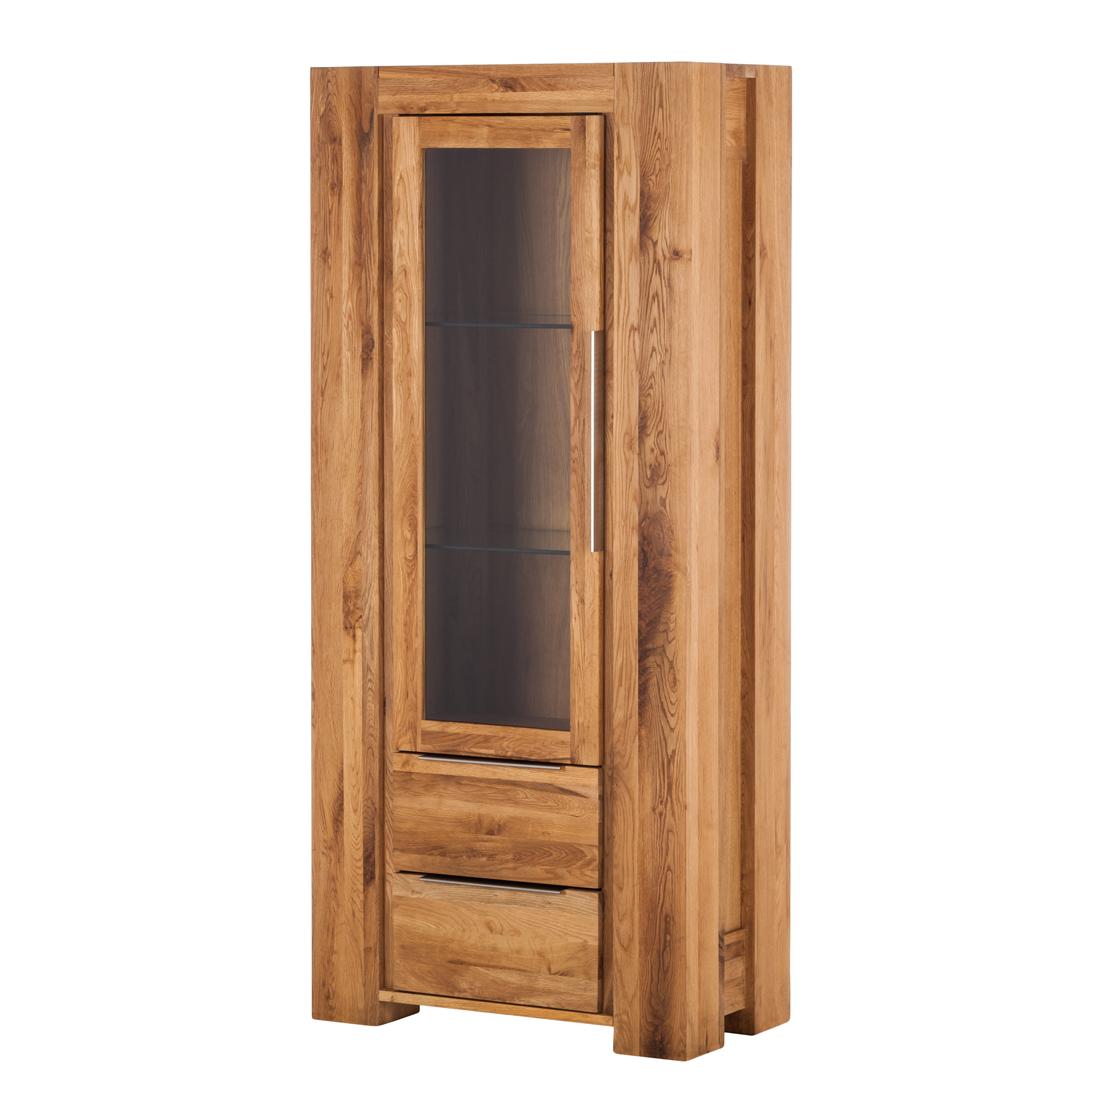 HOLTA Massivmöbel Vitrine Tomano - 1-deurs - massief eikenhout, geolied Home24